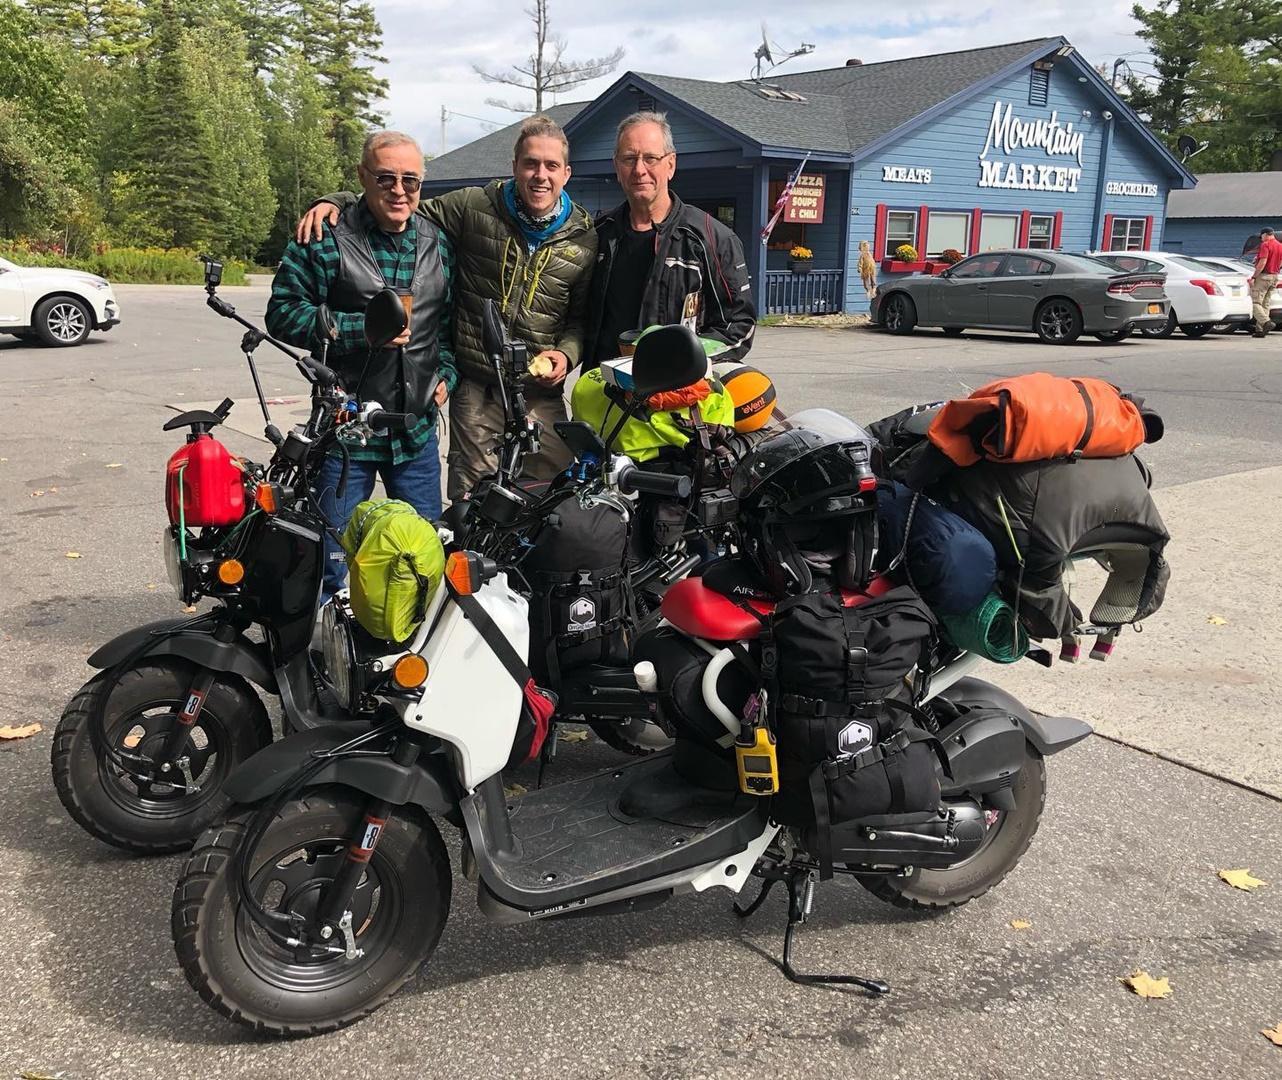 Dos chalados están recorriendo Estados Unidos sobre sendos scooter de 50 cc